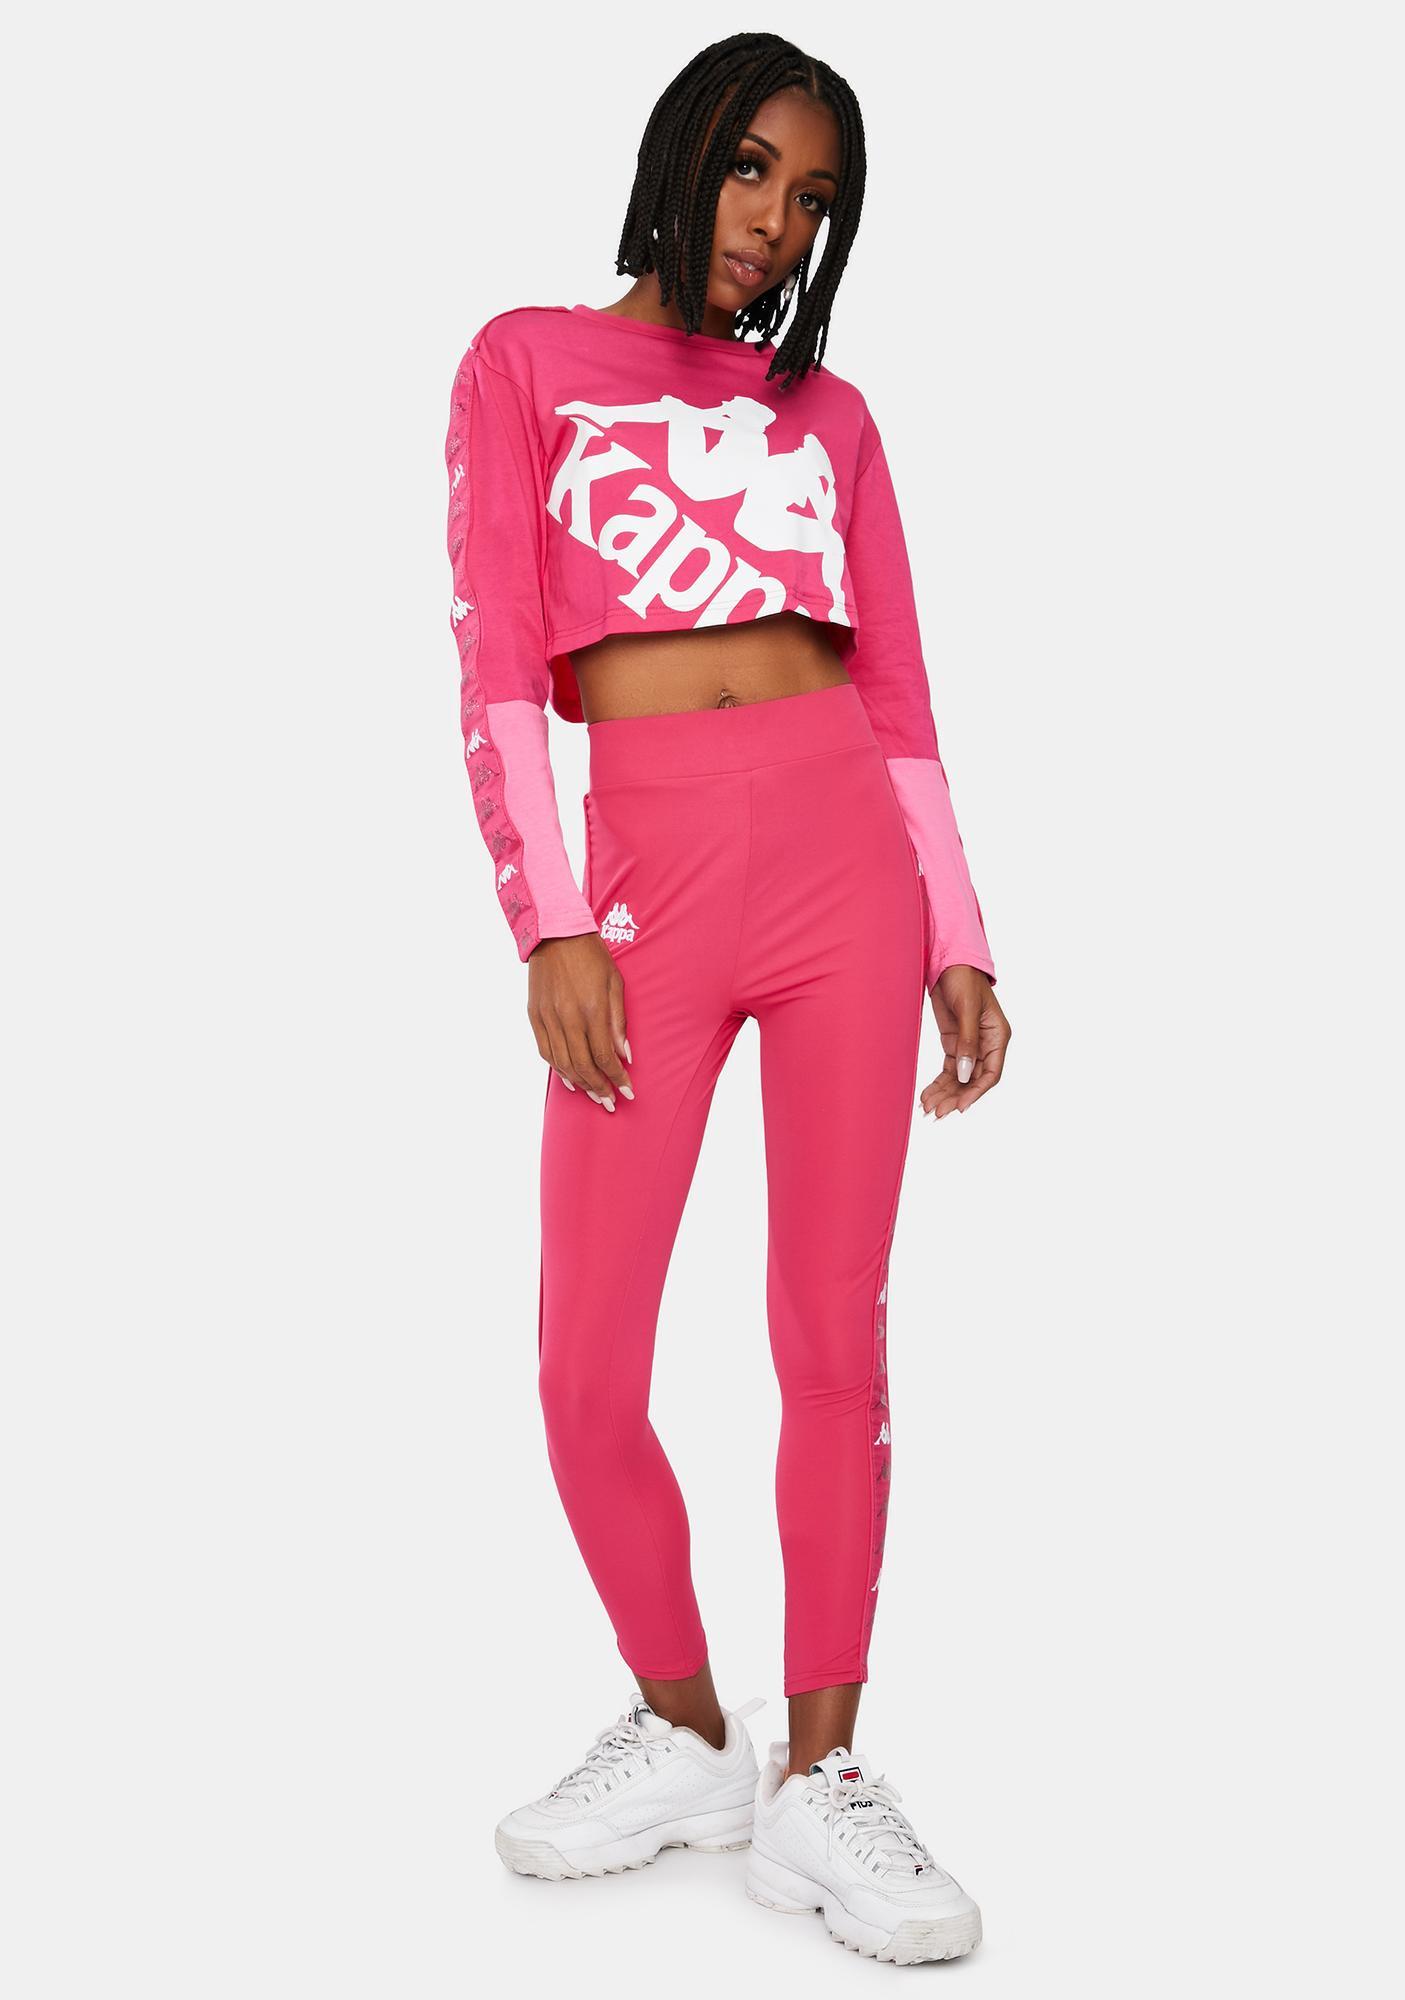 Kappa Pink 222 Banda Baloys Long Sleeve Crop Top